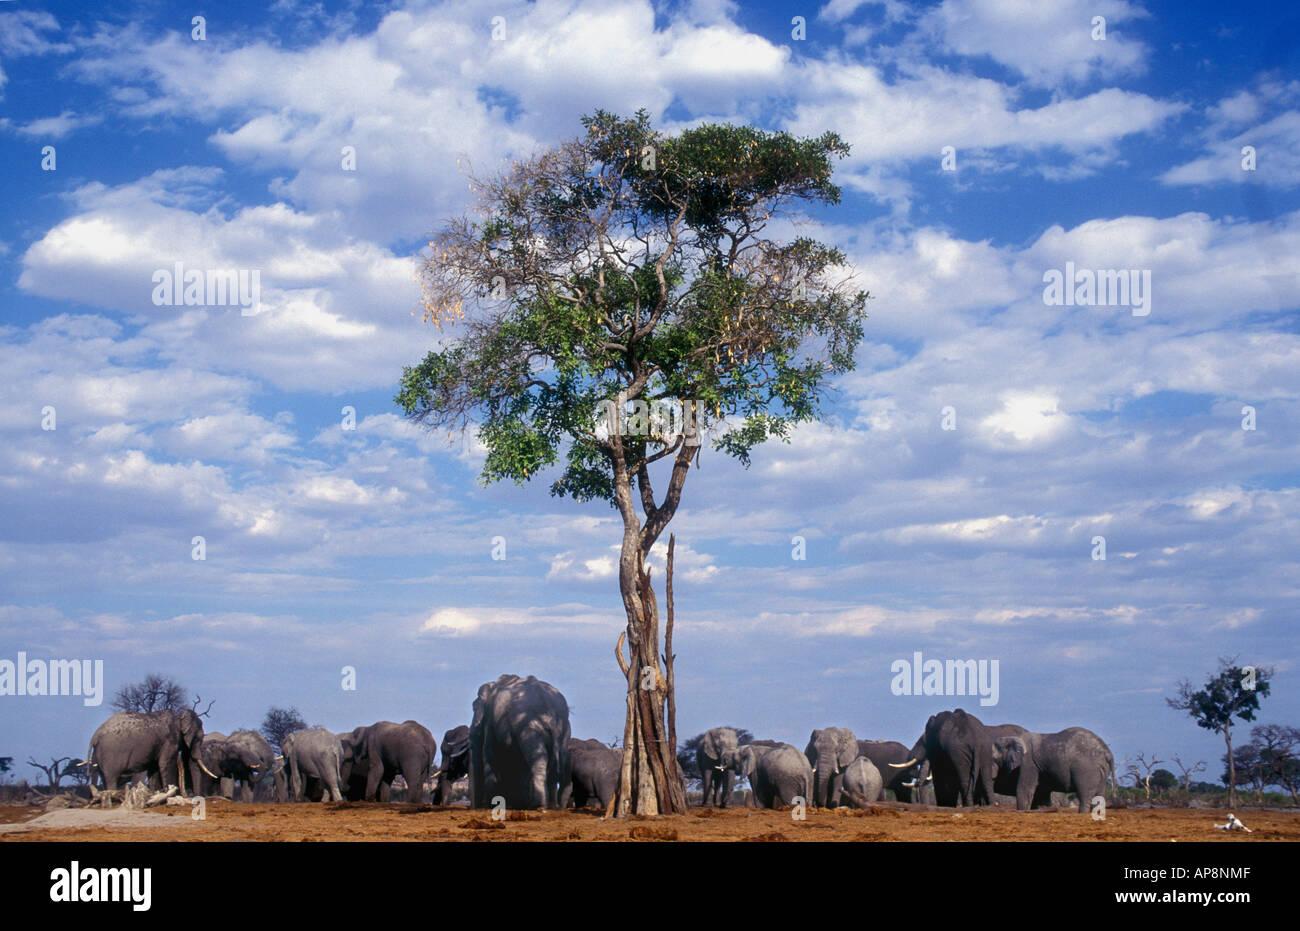 Elephant family herd clustered around tree and waterhole near Savuti South Camp Chobe National Park Botswana - Stock Image